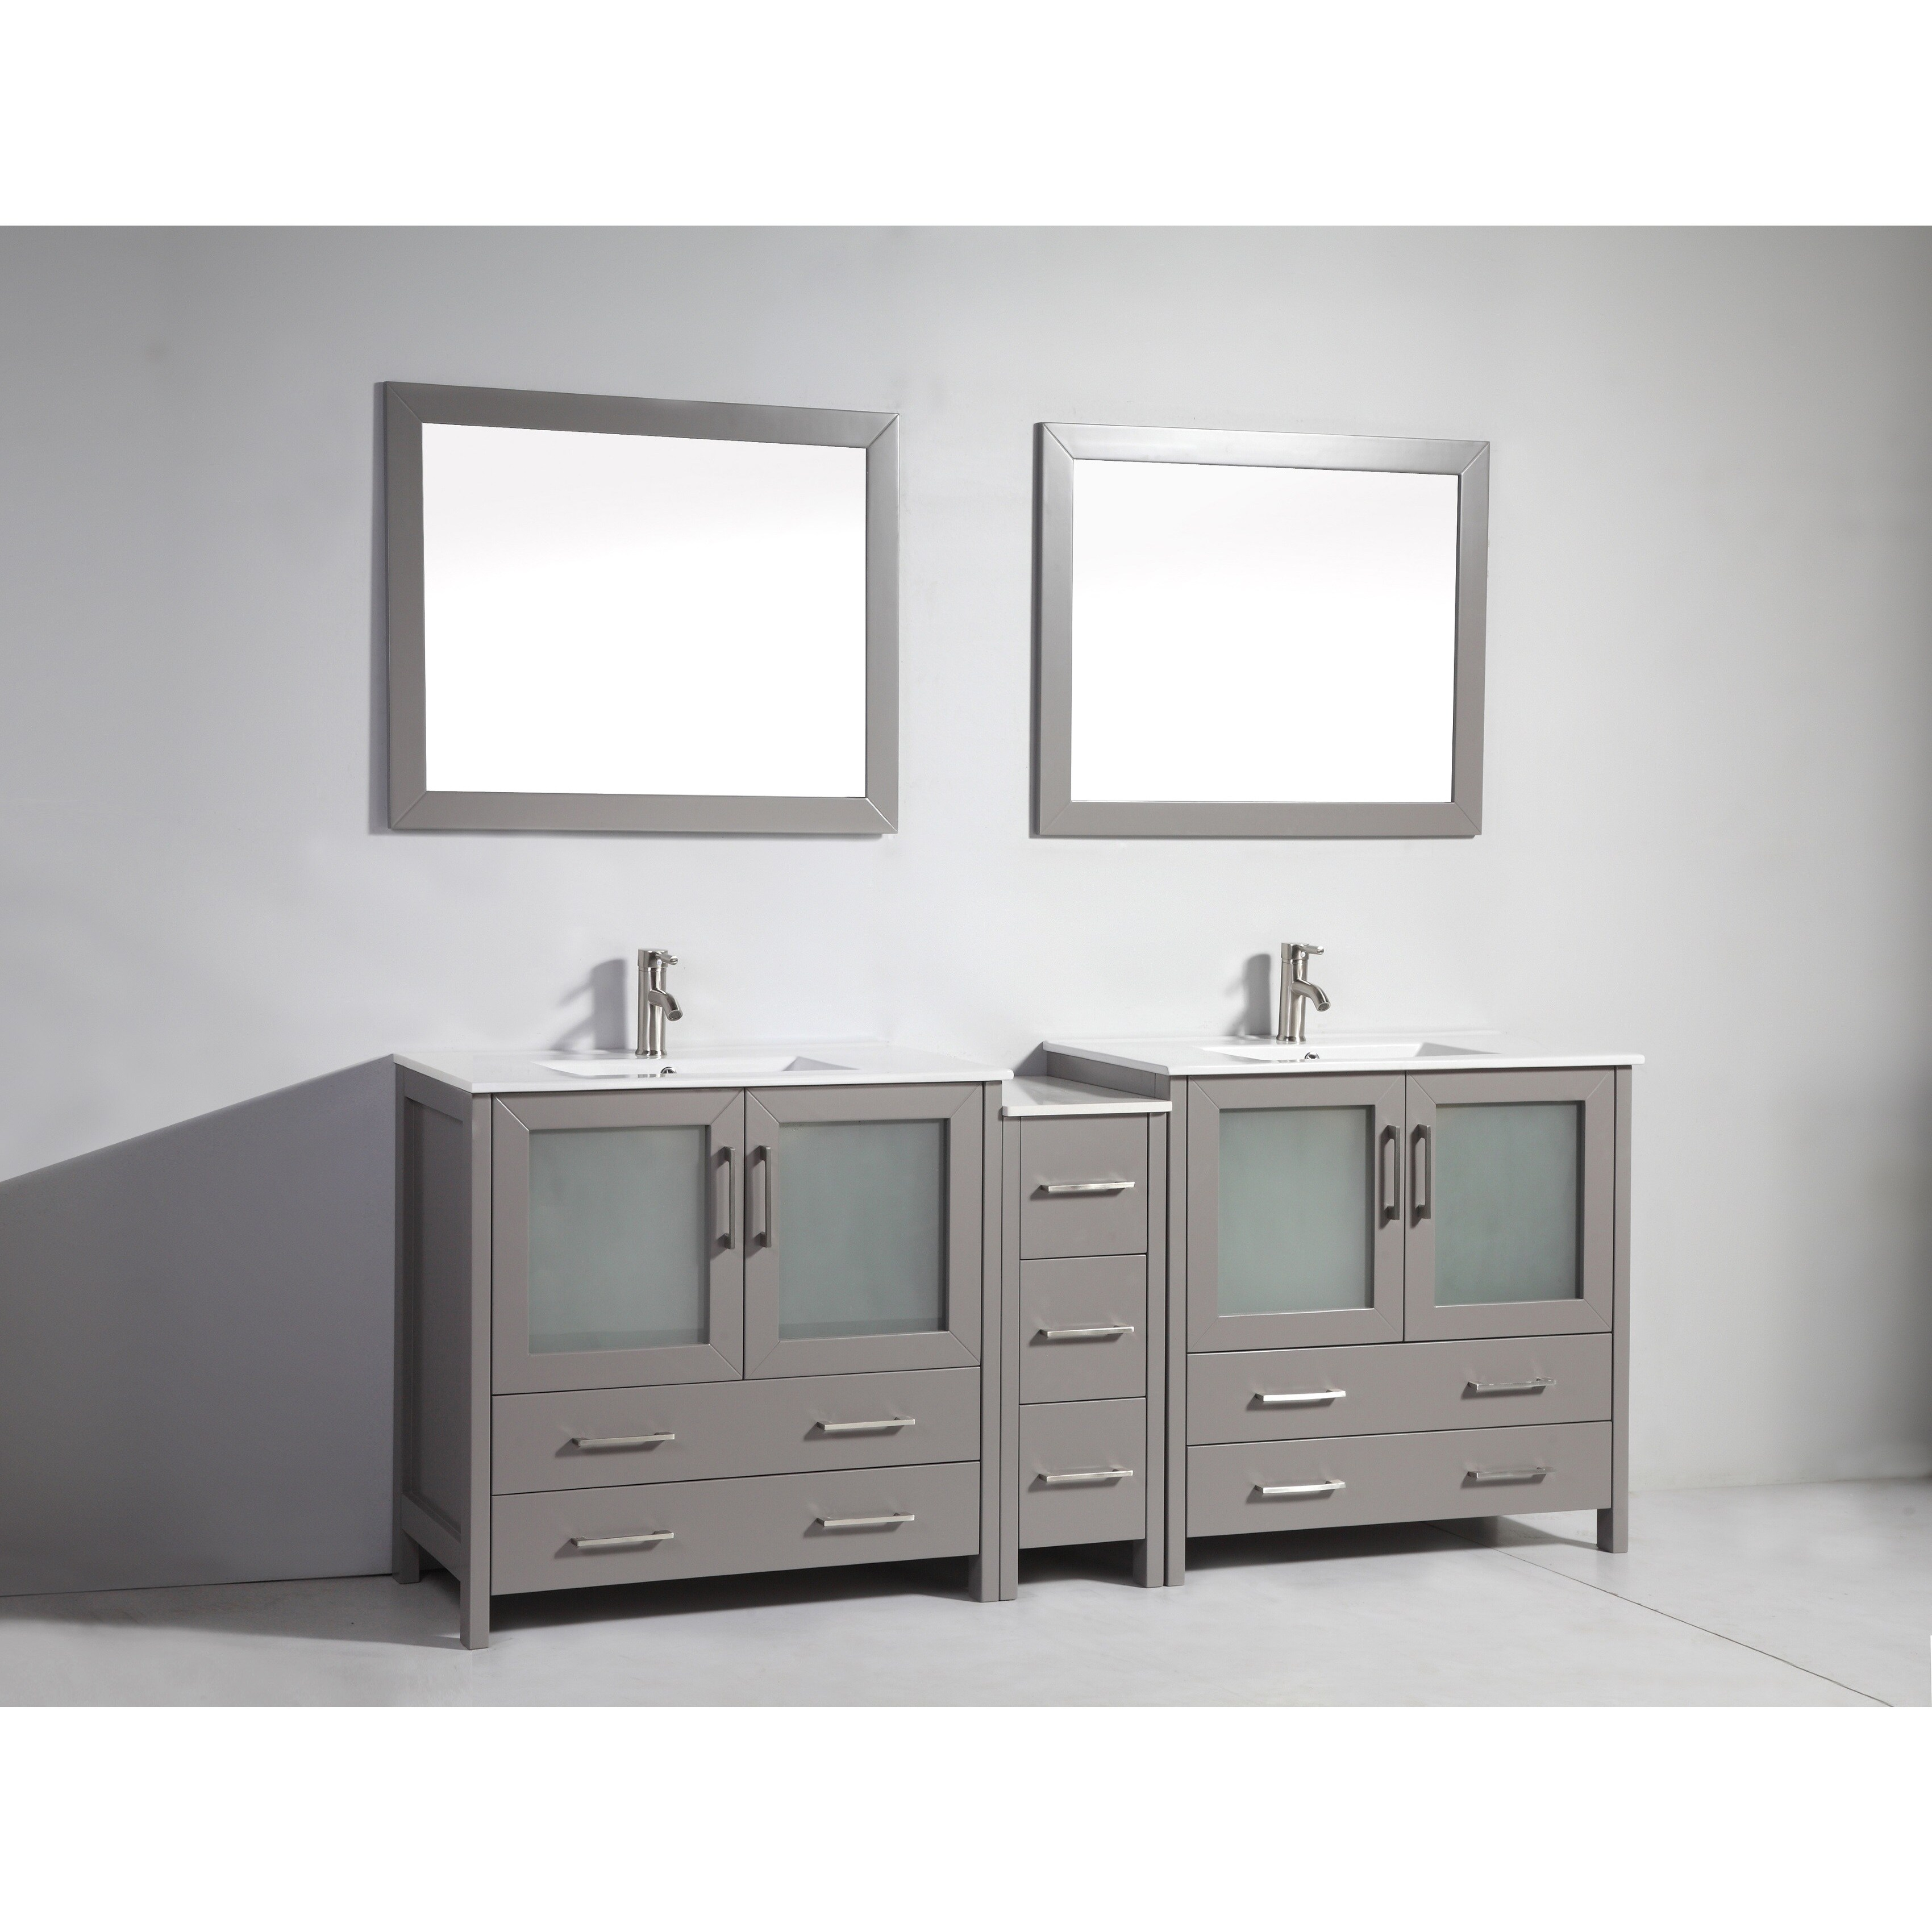 Vanity-Art-84-inch-Double-sink-Bathroom-Vanity-